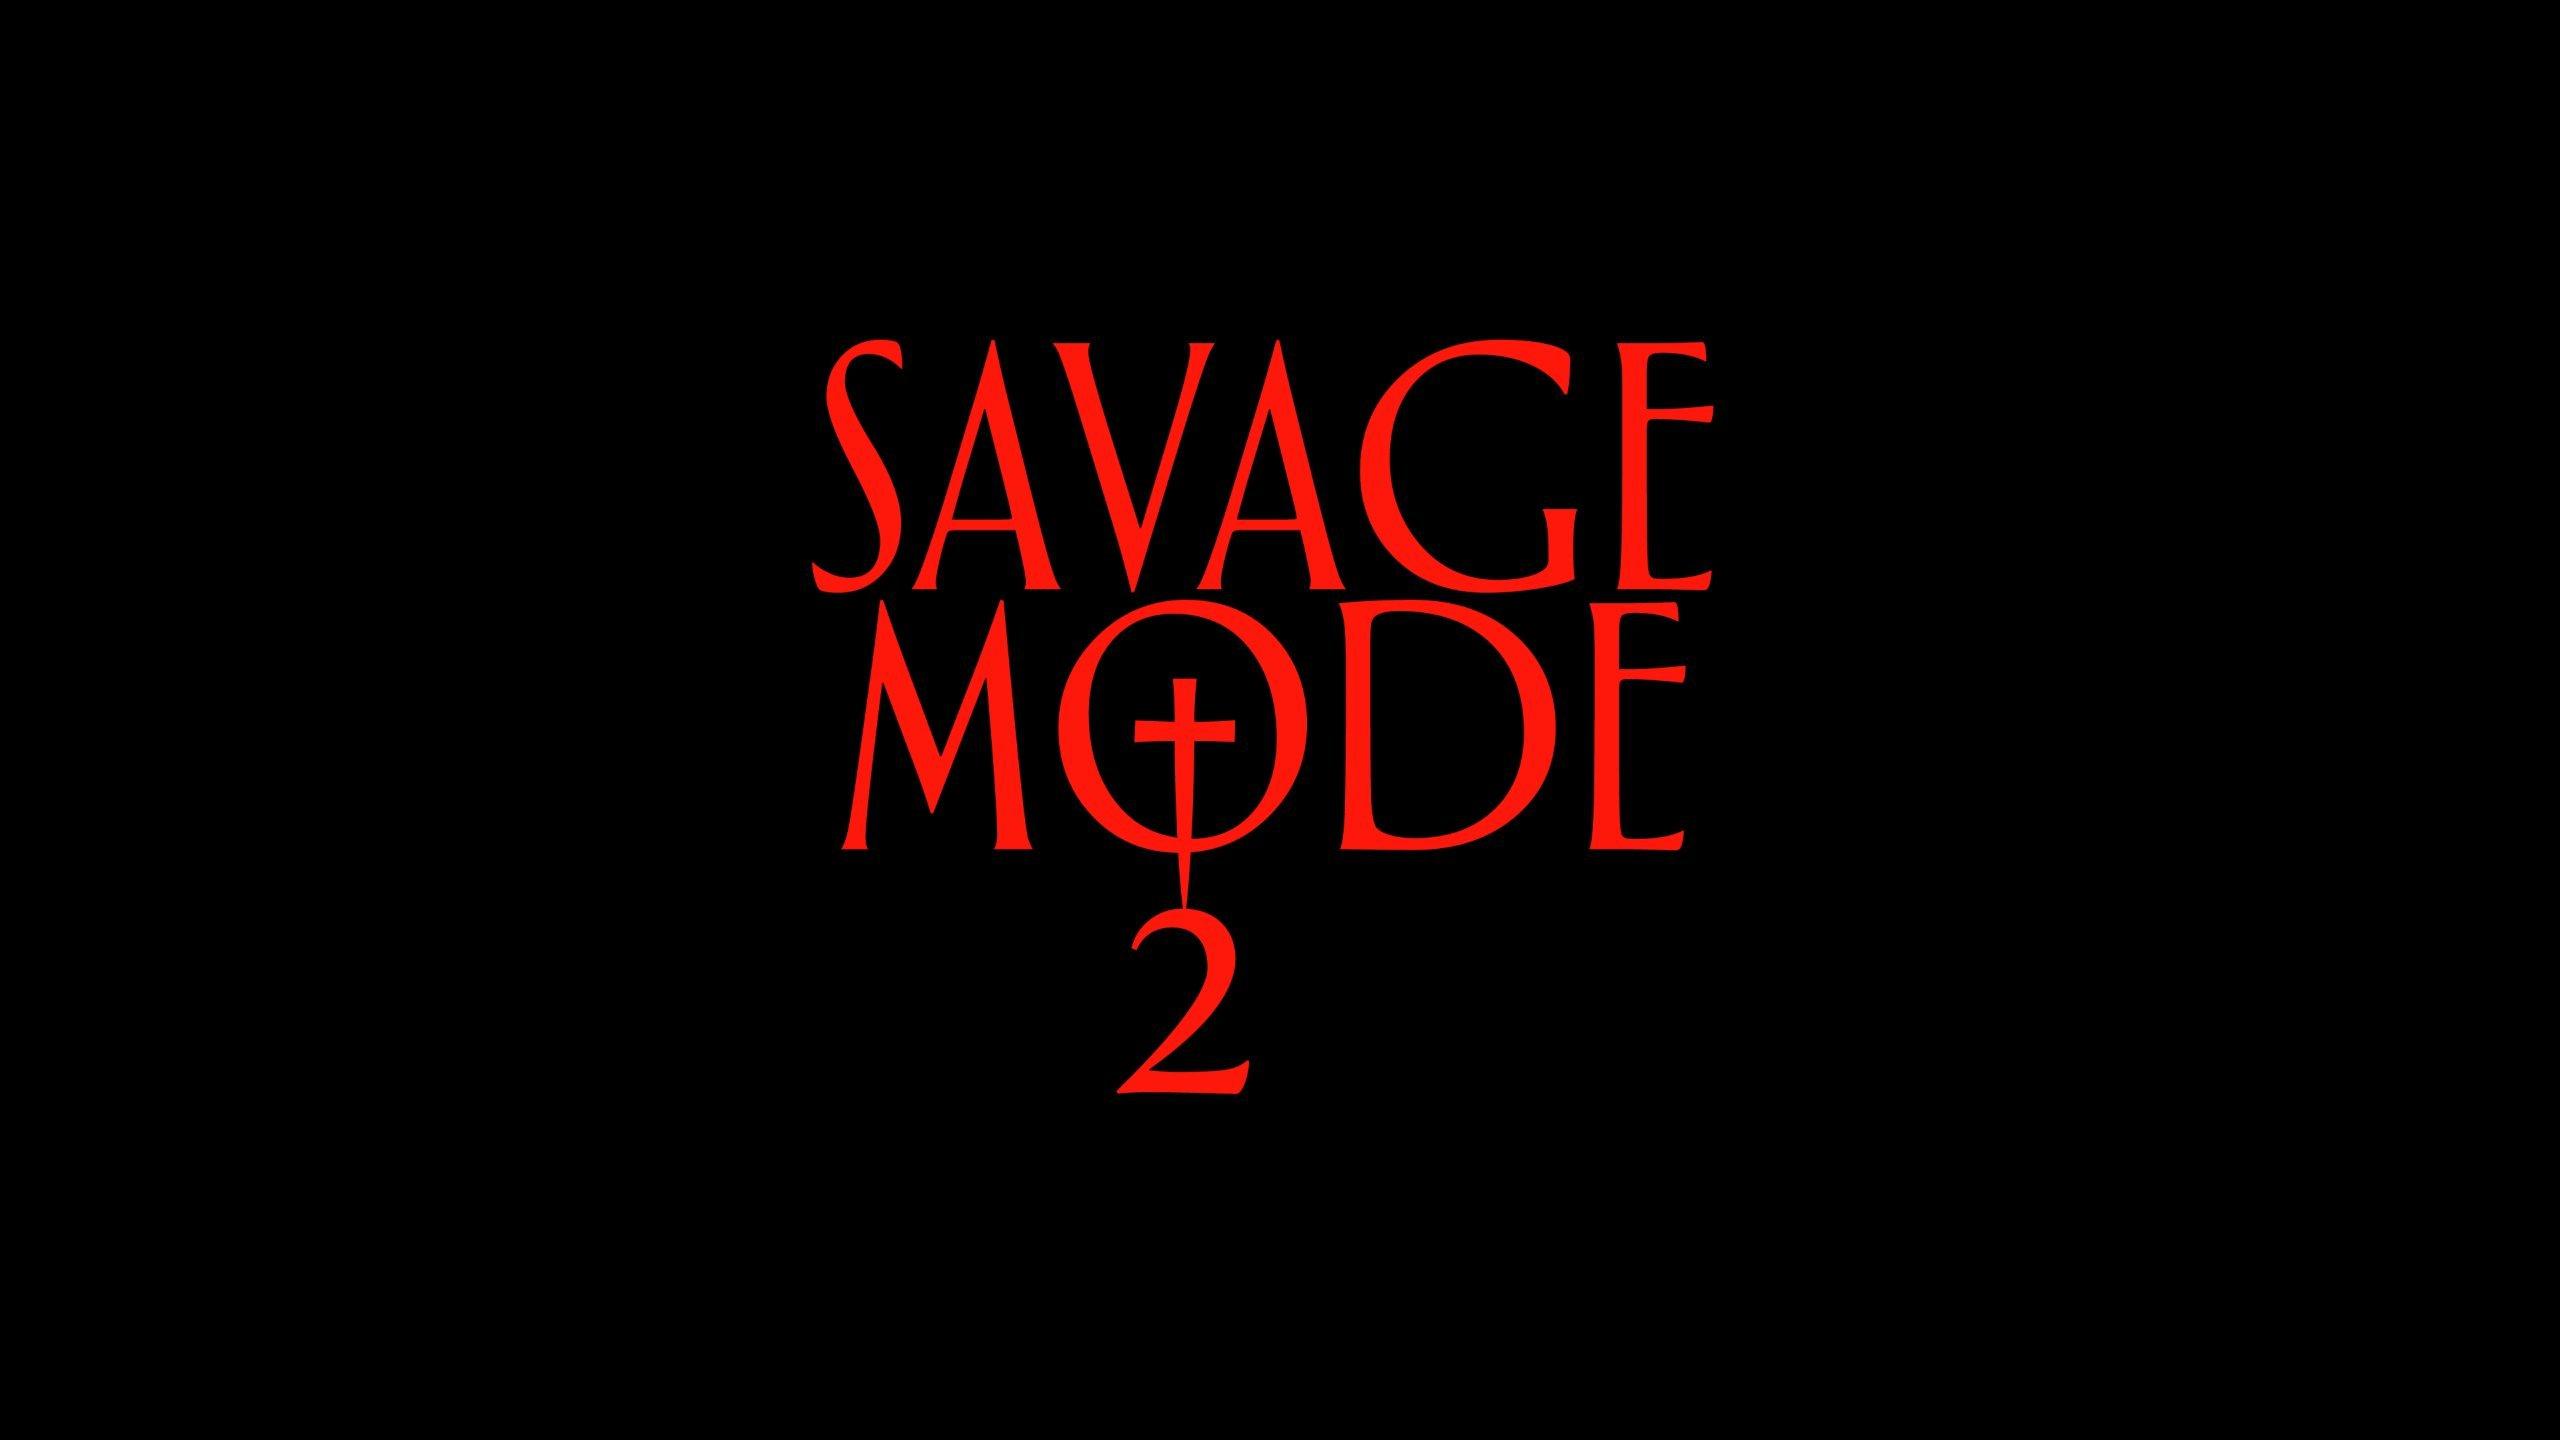 SAVAGE MODE II-merch-product 1 slider-02